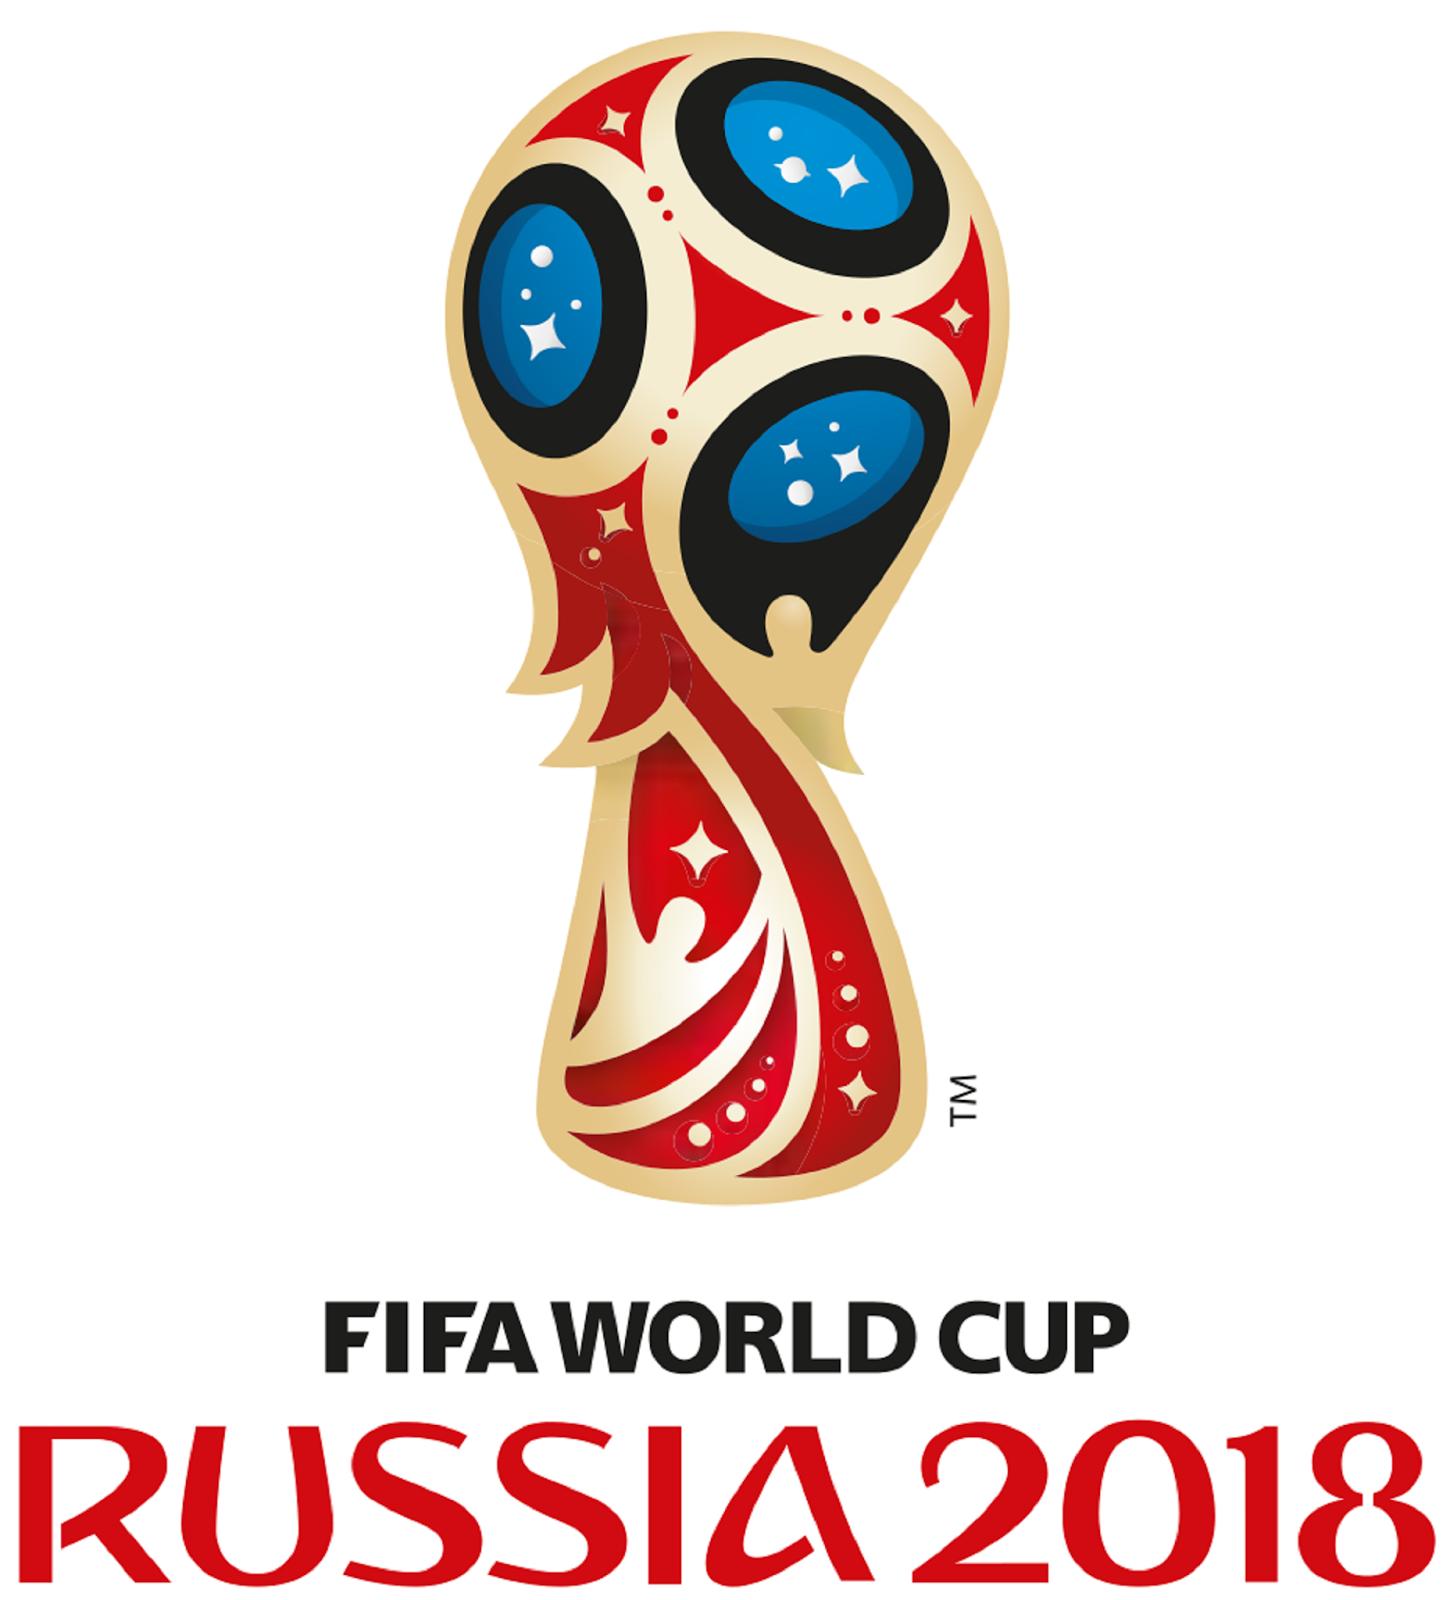 FIFA WORLD CUP 2018 B